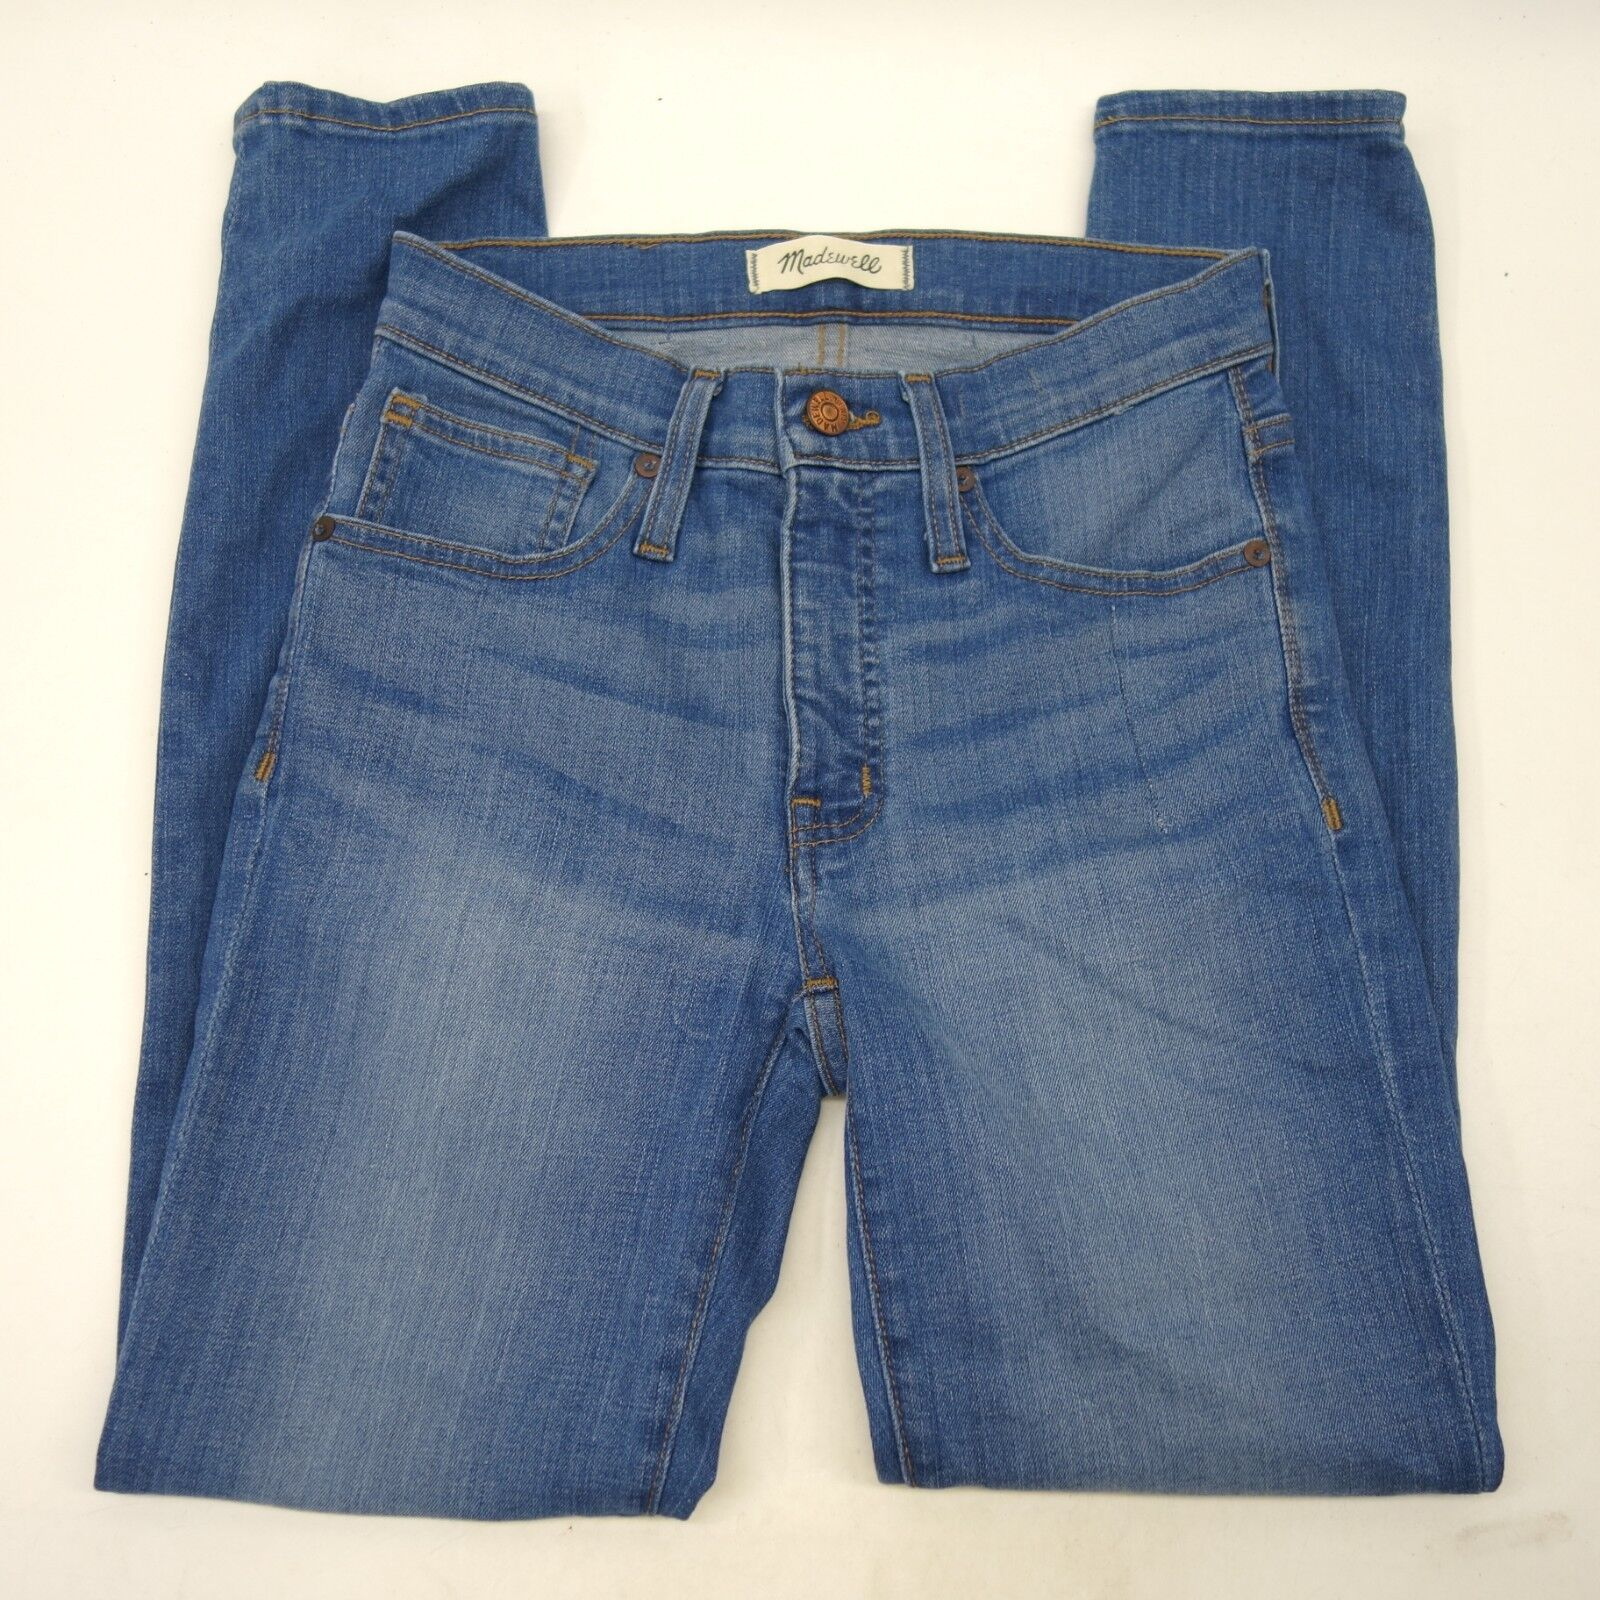 New Madewell The 9  High-Rise Slim Boyjean Skinny Crop in bluee 25 X 27